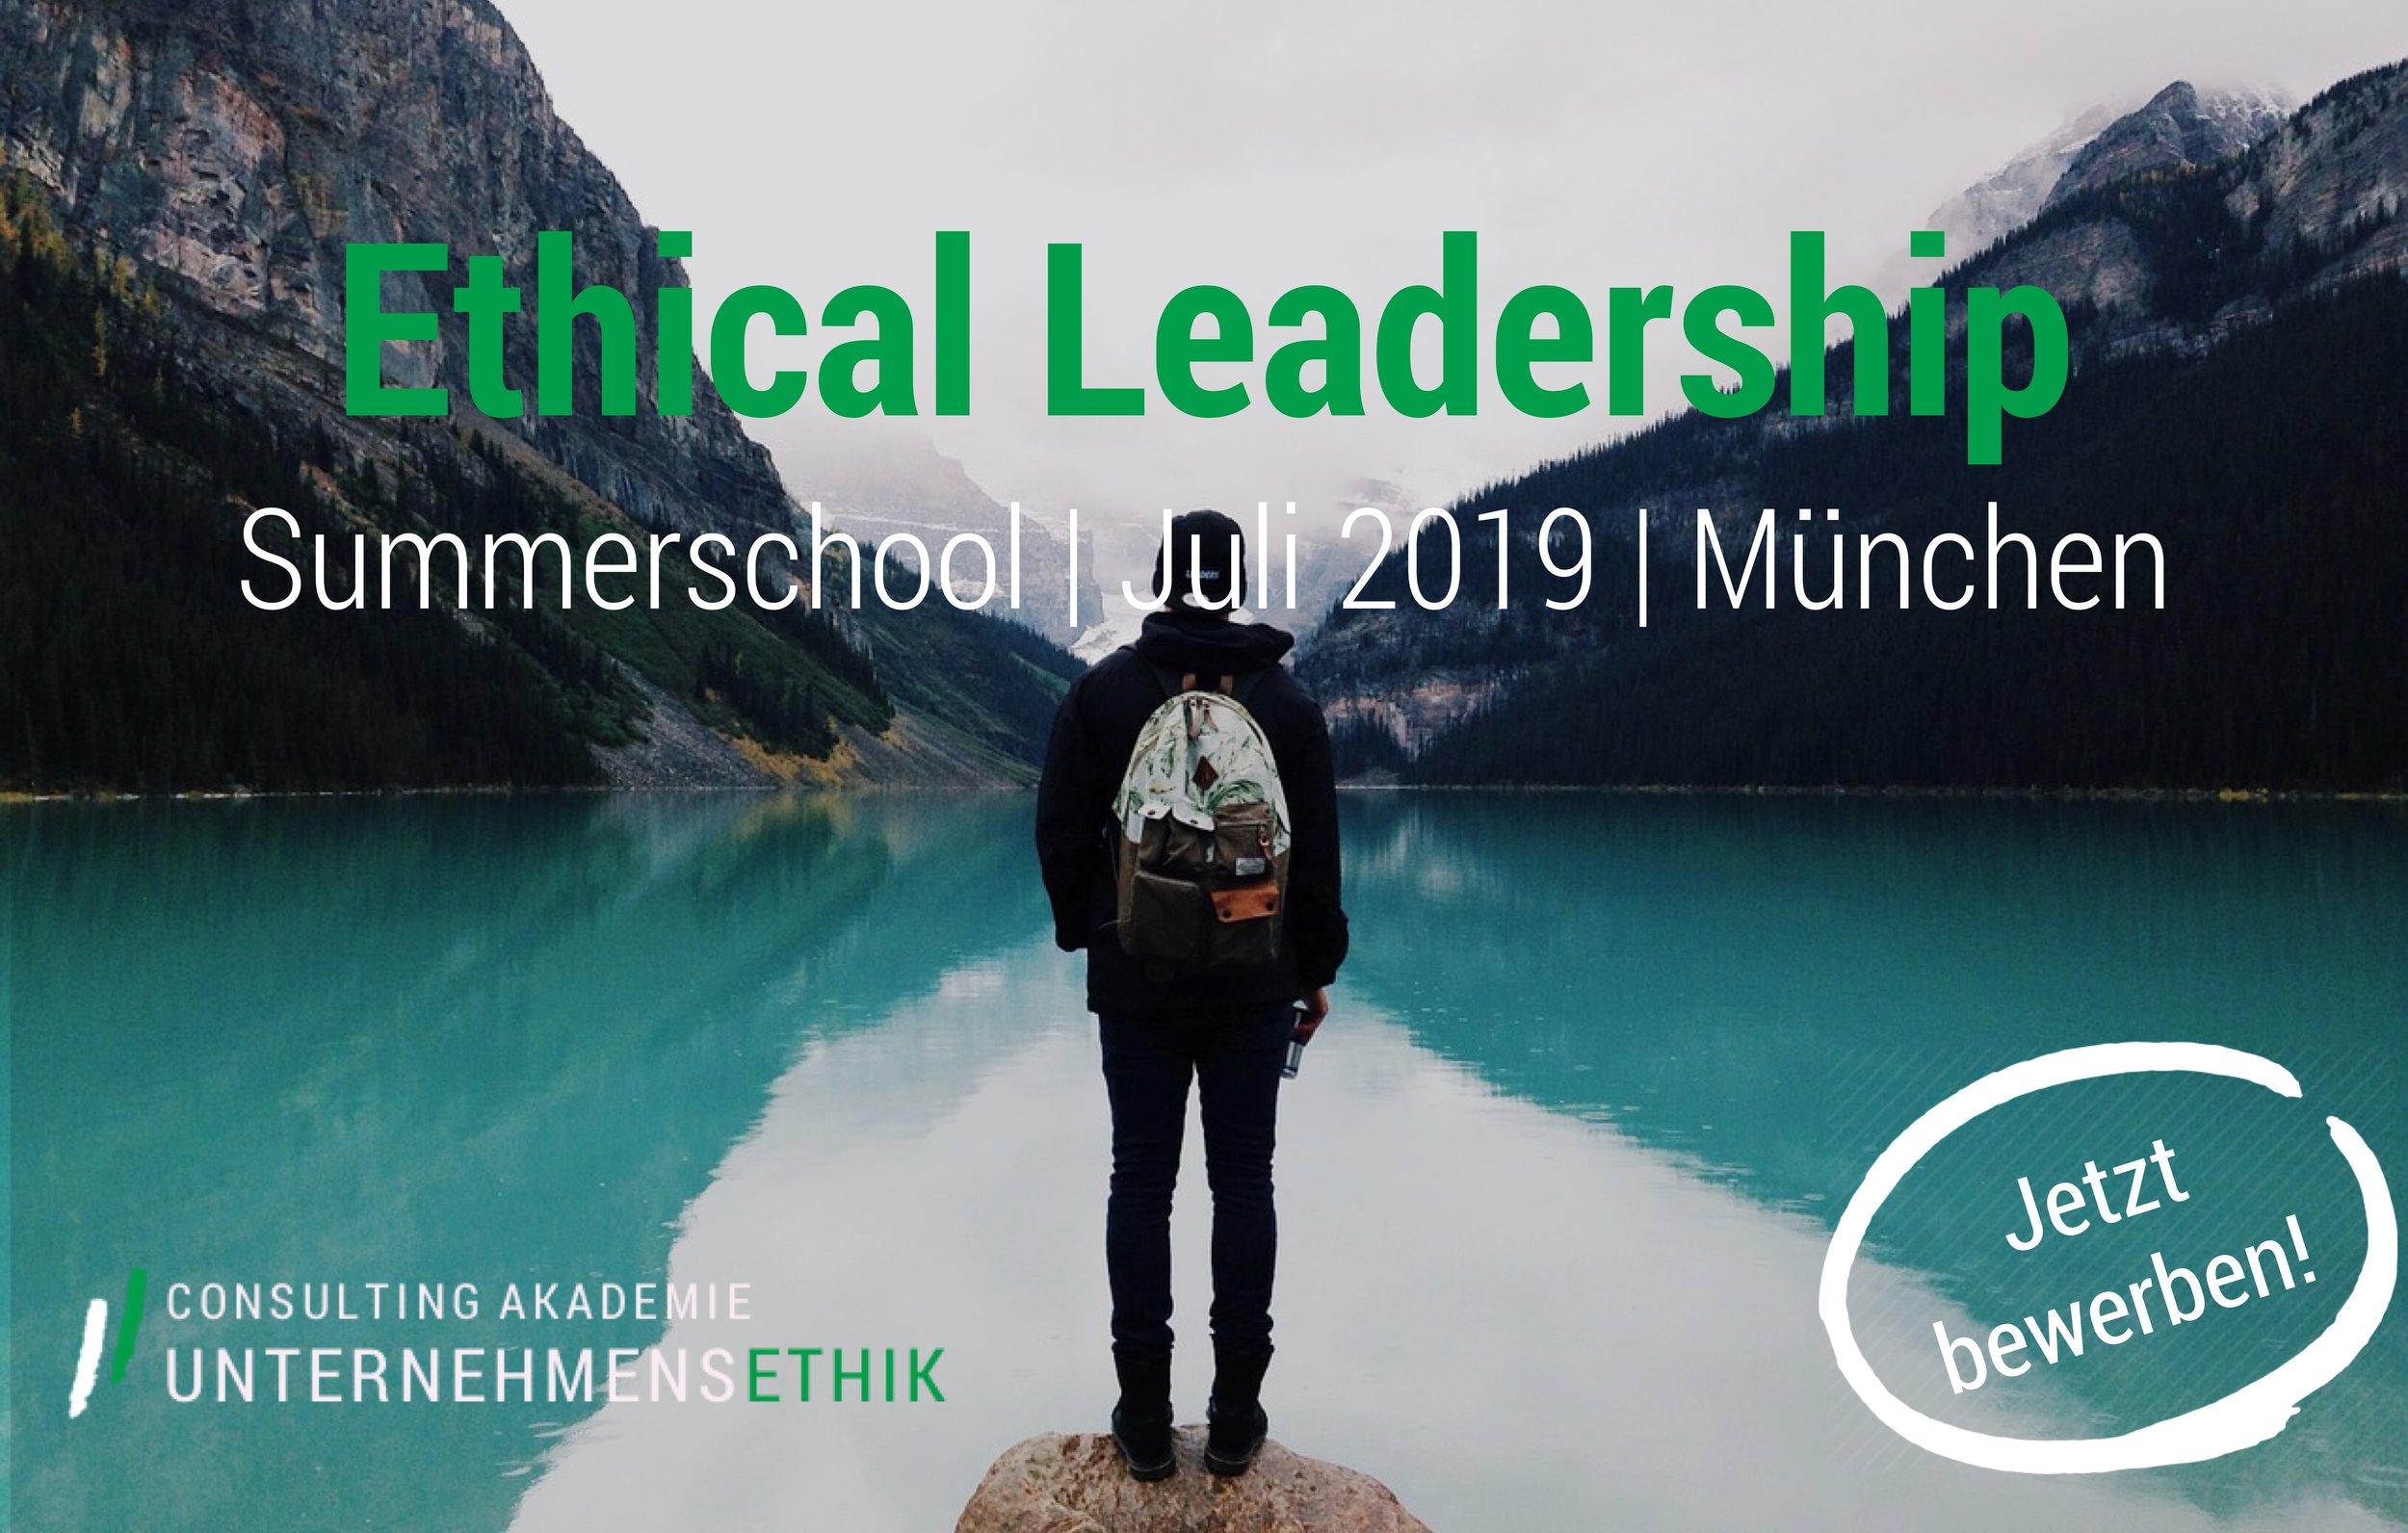 Ethical Leadership_jetzt bewerben.jpg